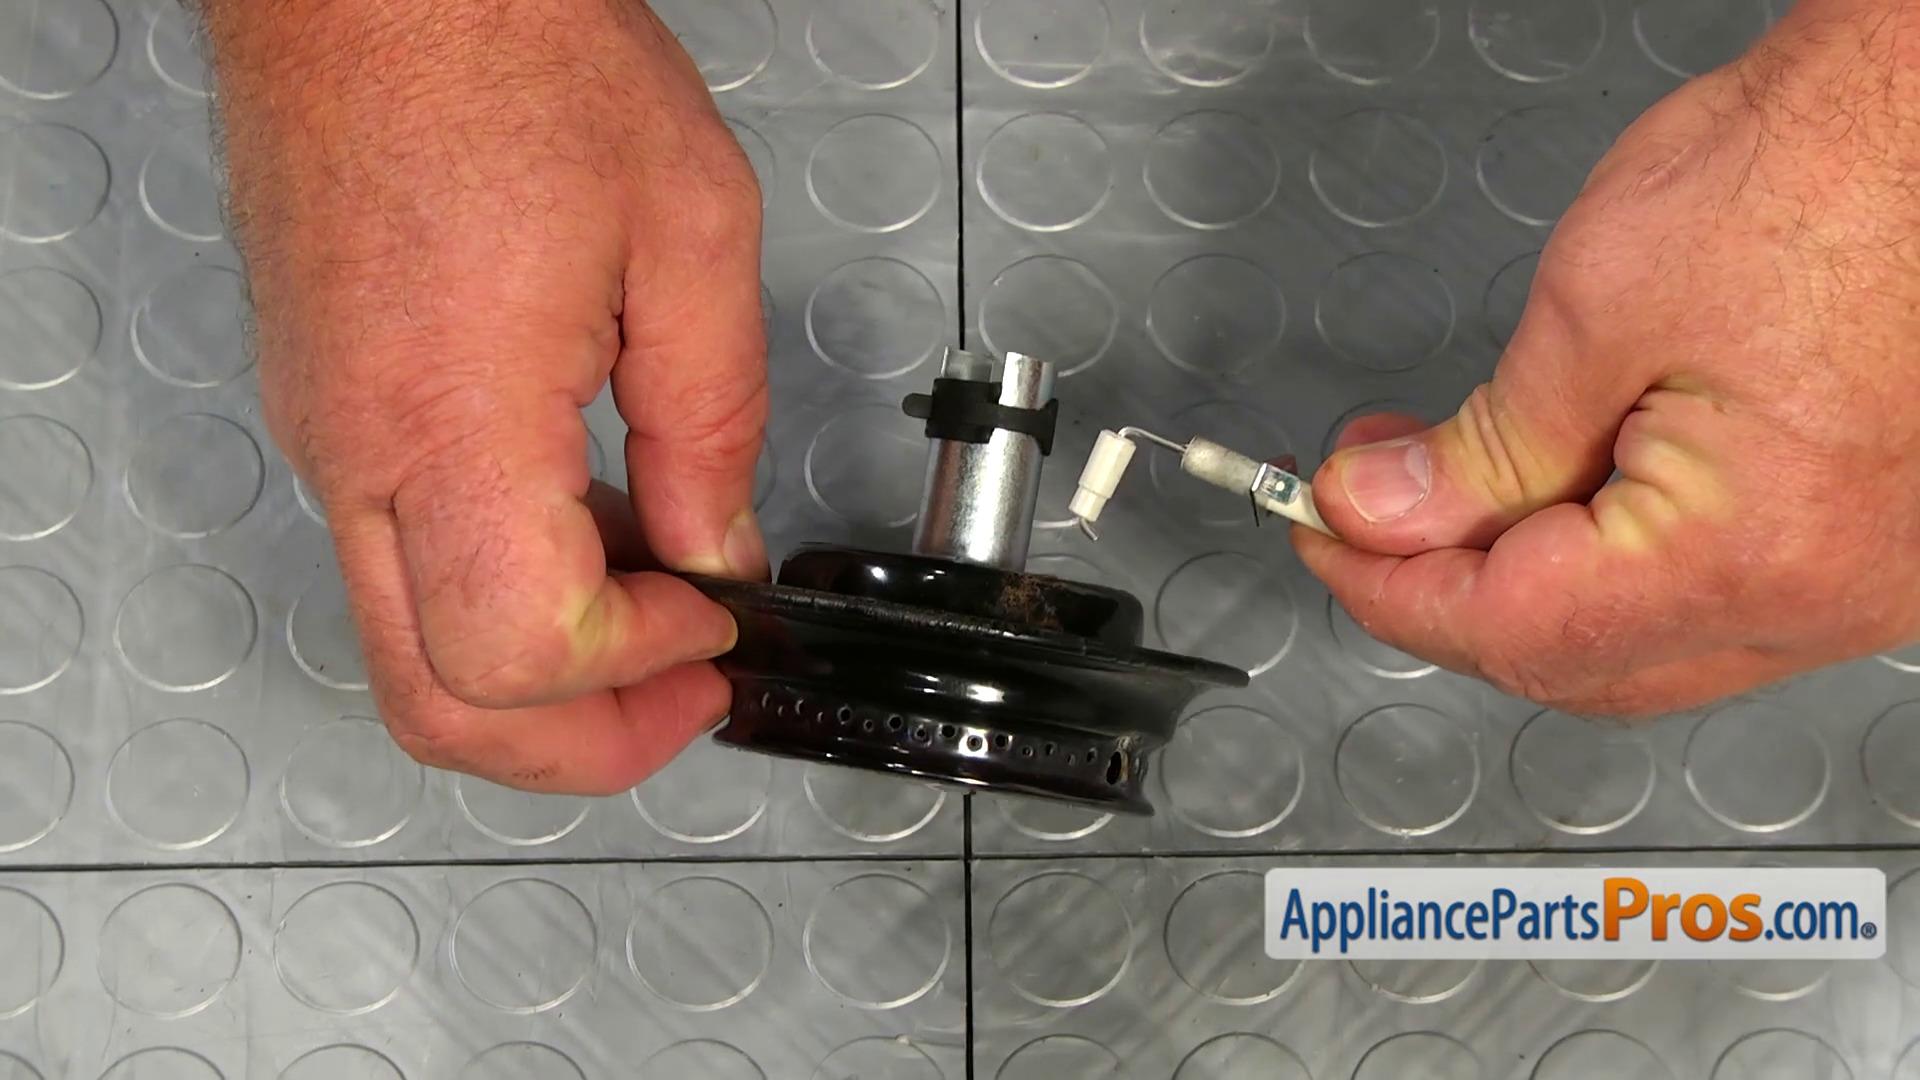 ae9c476bc25699dfc7d73962516c6fcbe59af117?image_crop_resized=640x360 whirlpool 74004053 top burner spark igniter appliancepartspros com JDS9860AAP Specs at eliteediting.co